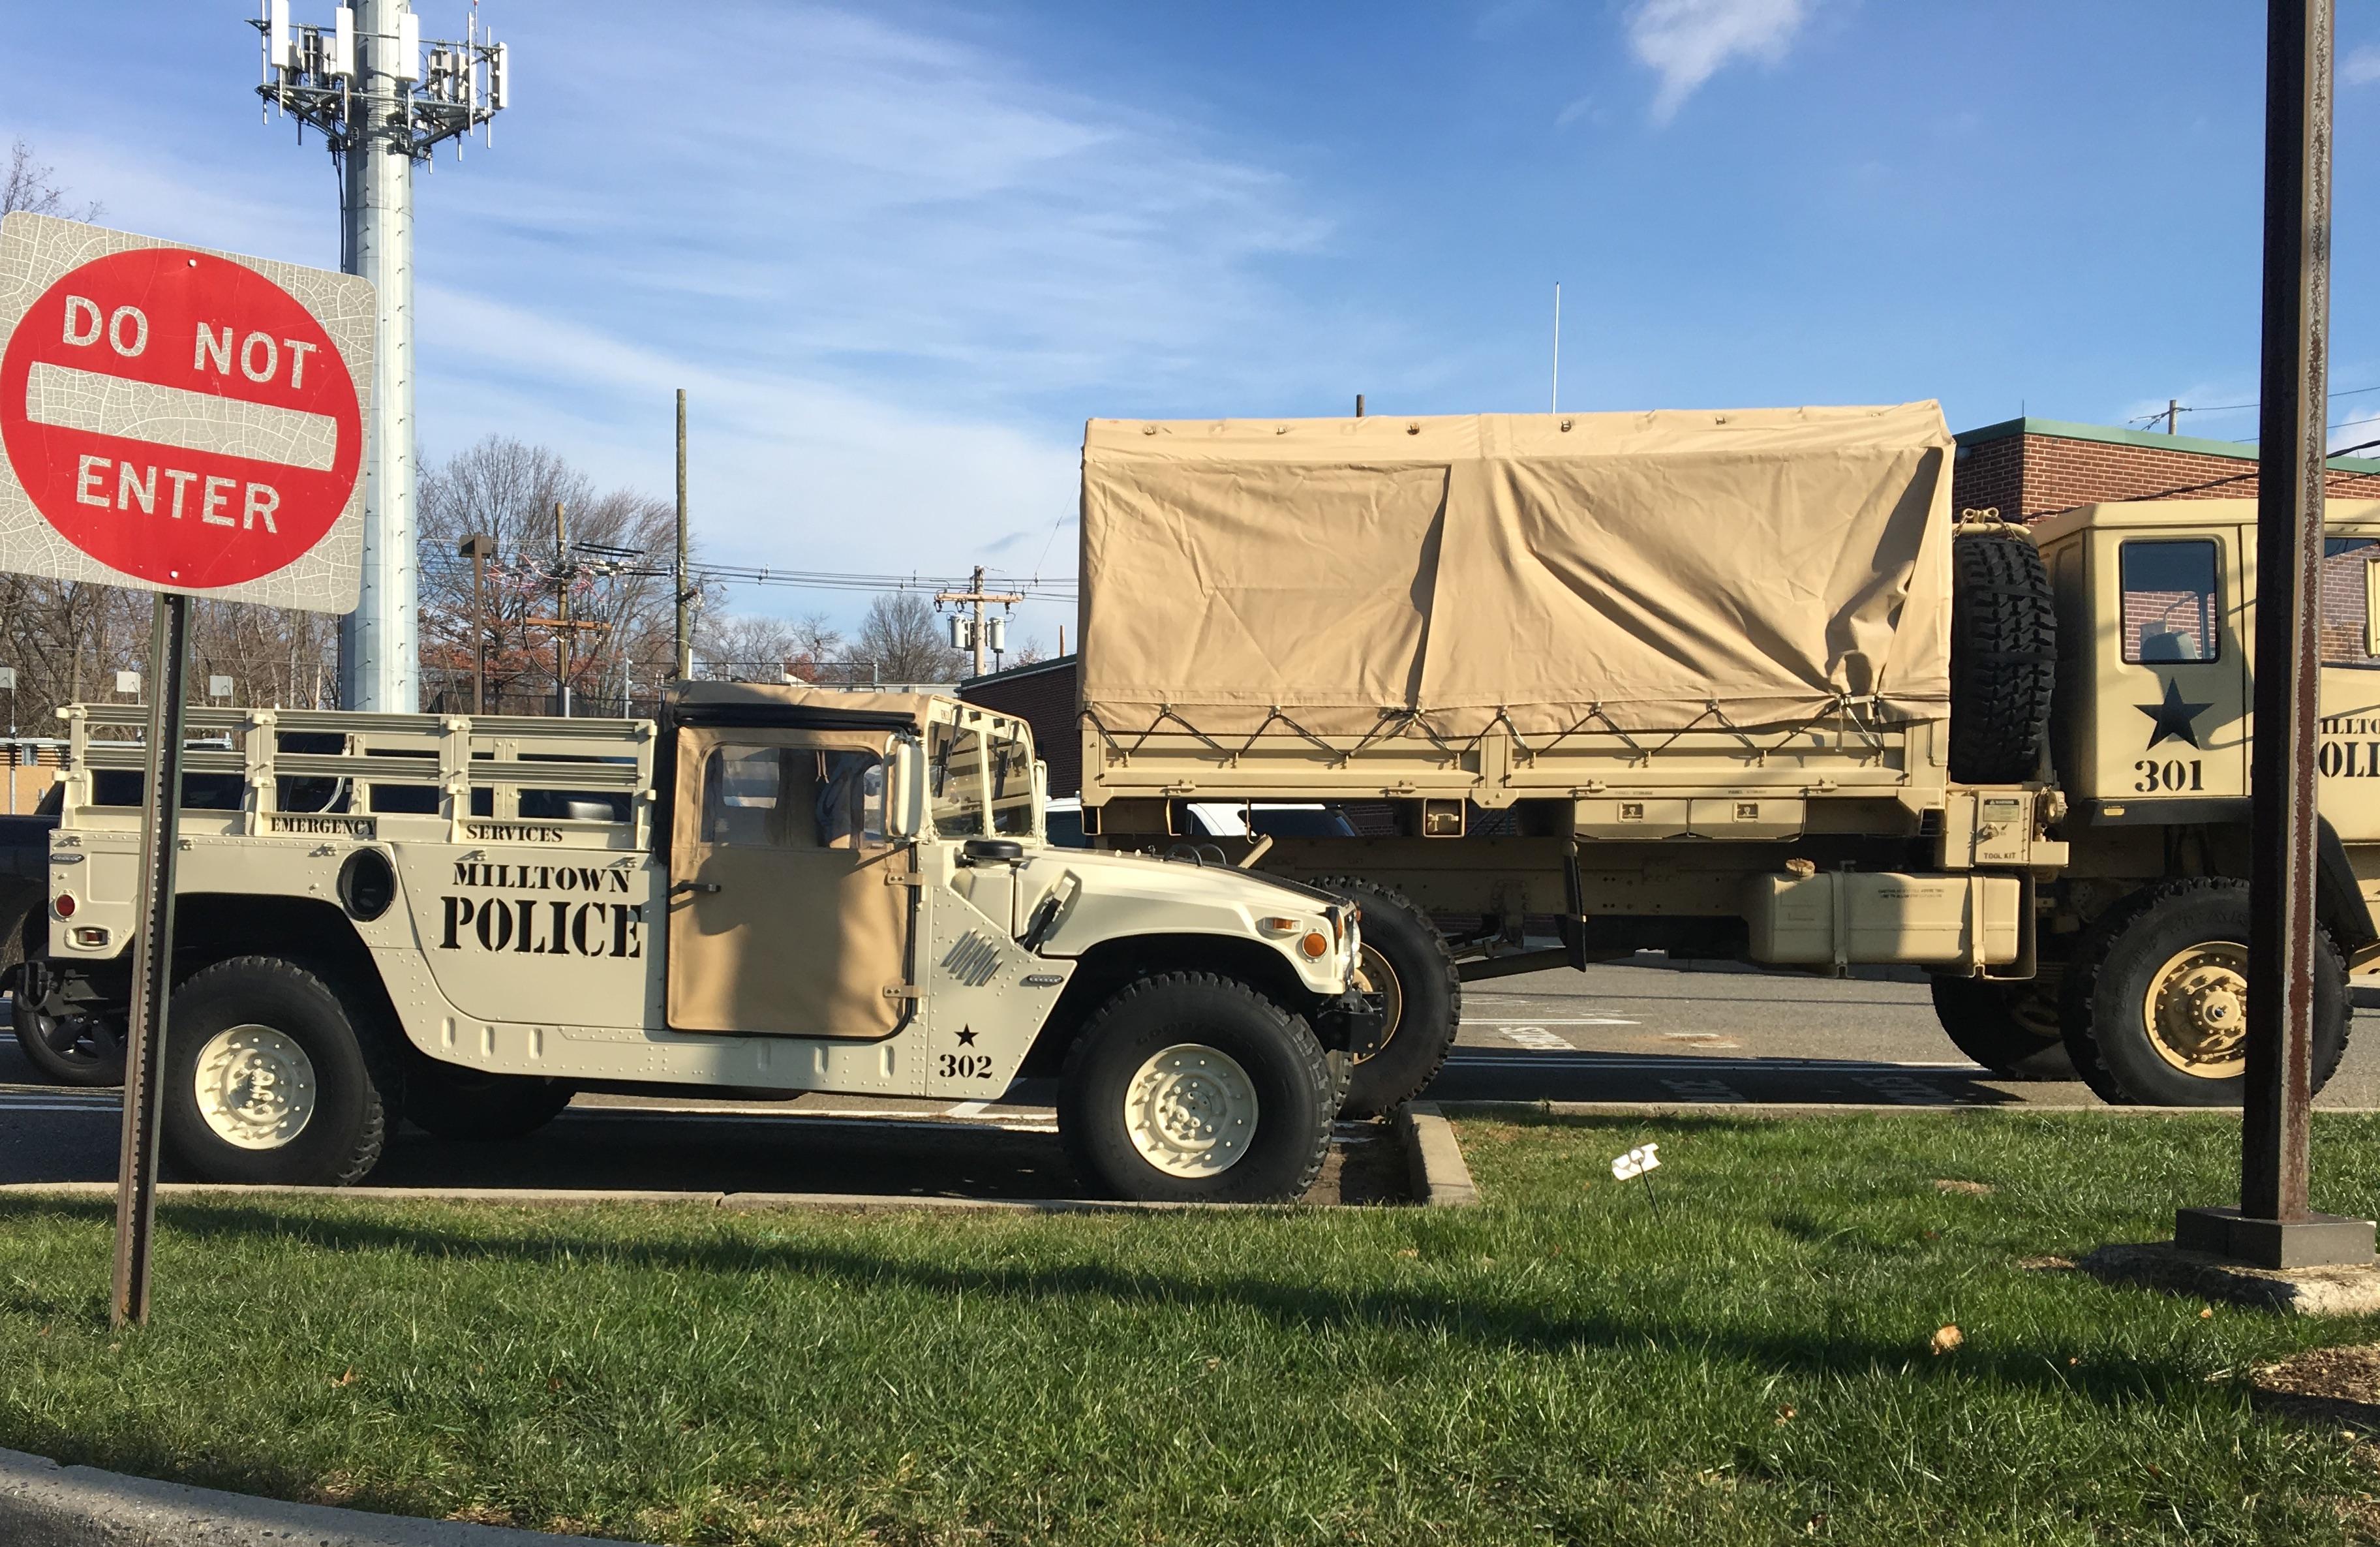 N J cops 2 year military surplus haul $40M in gear 13 armored